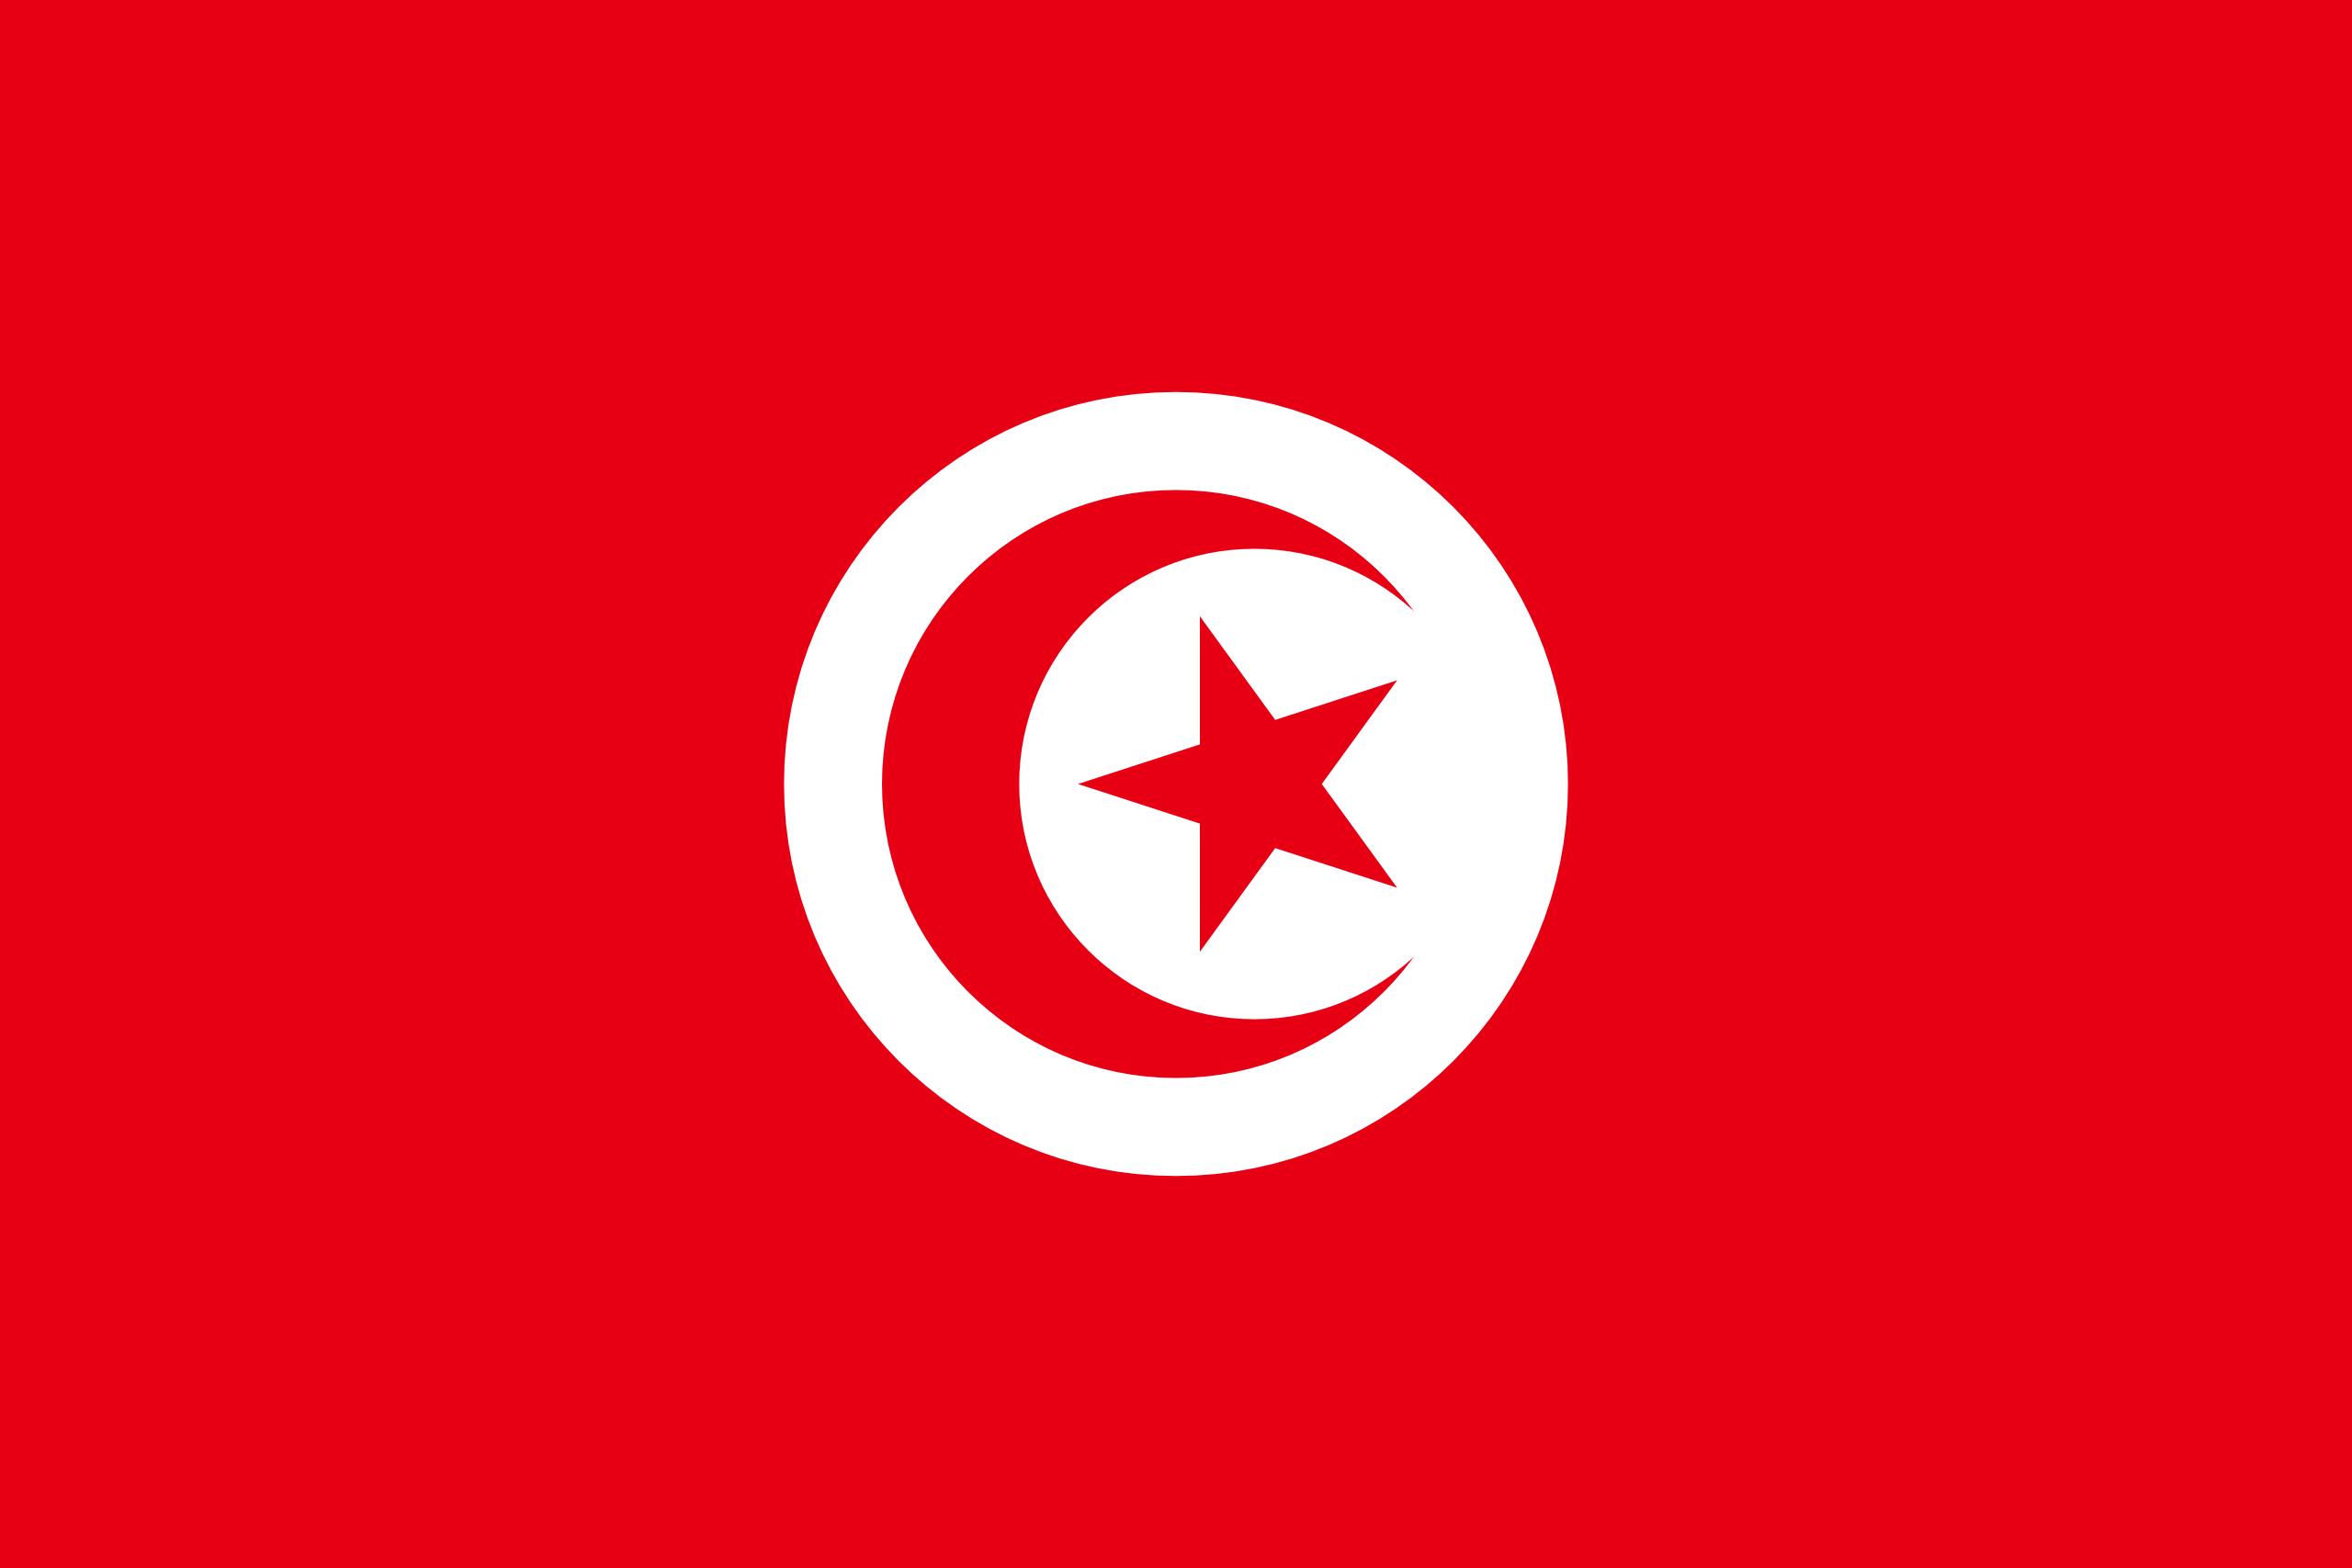 ट्यूनीशिया, देश, emblema, लोग�प्रतीकbolo - HD वॉलपेपर - प्रोफेसर-falken.com